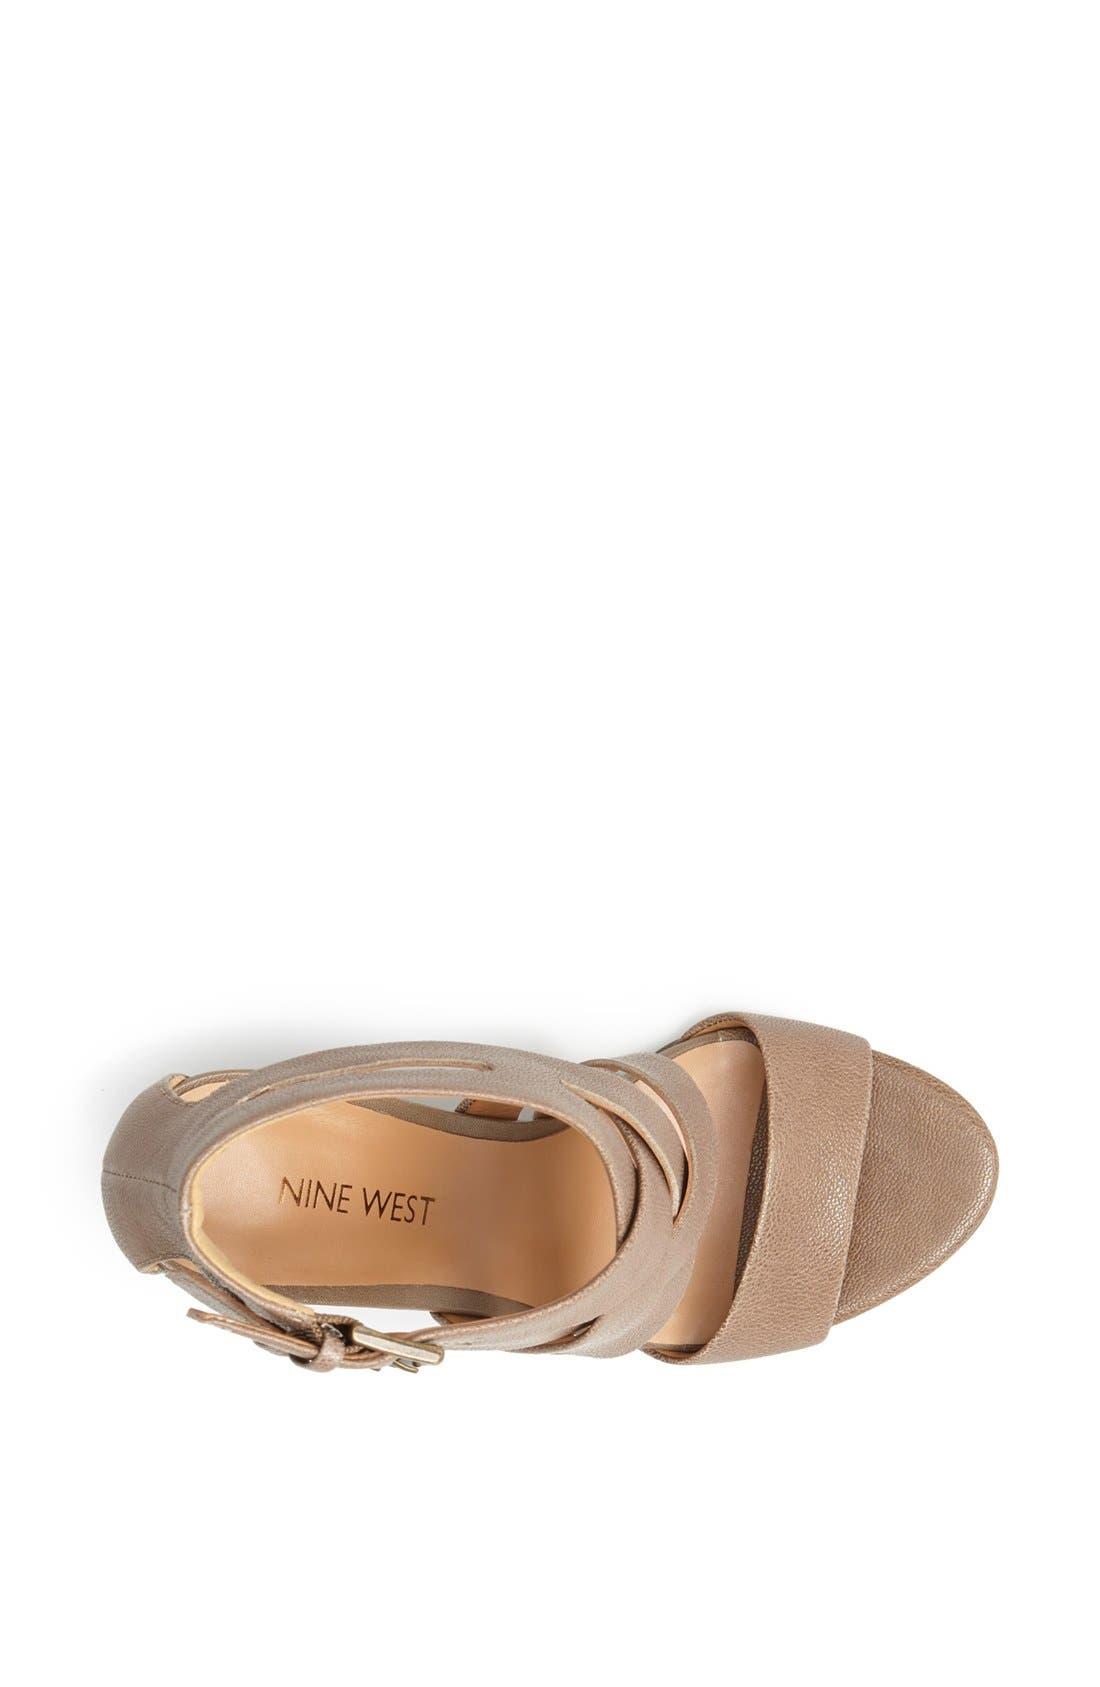 Alternate Image 3  - Nine West 'Maureen' Wedge Sandal